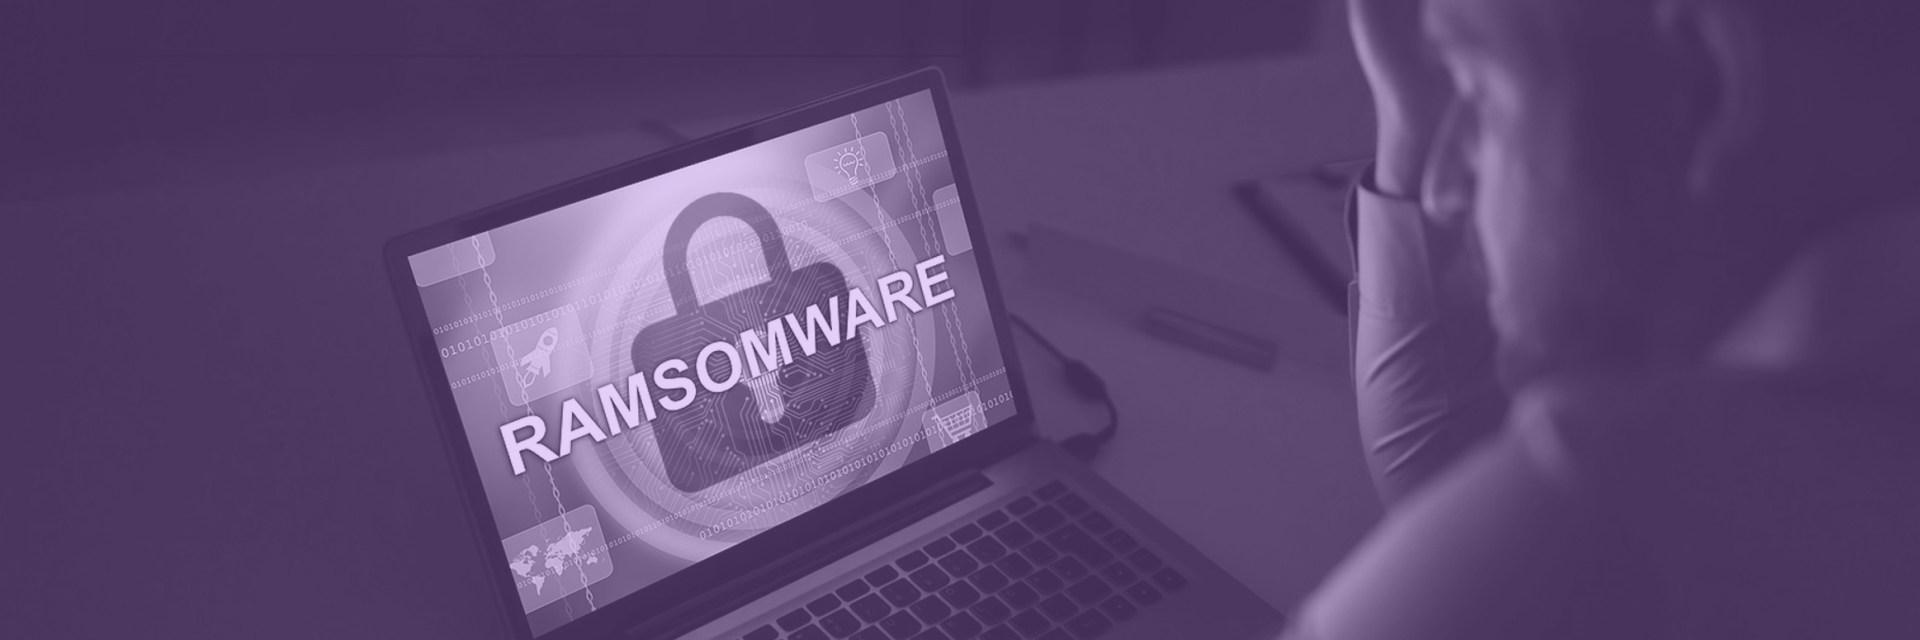 REvil Ransomware Gang Warns Stolen Apple Blueprint Leak